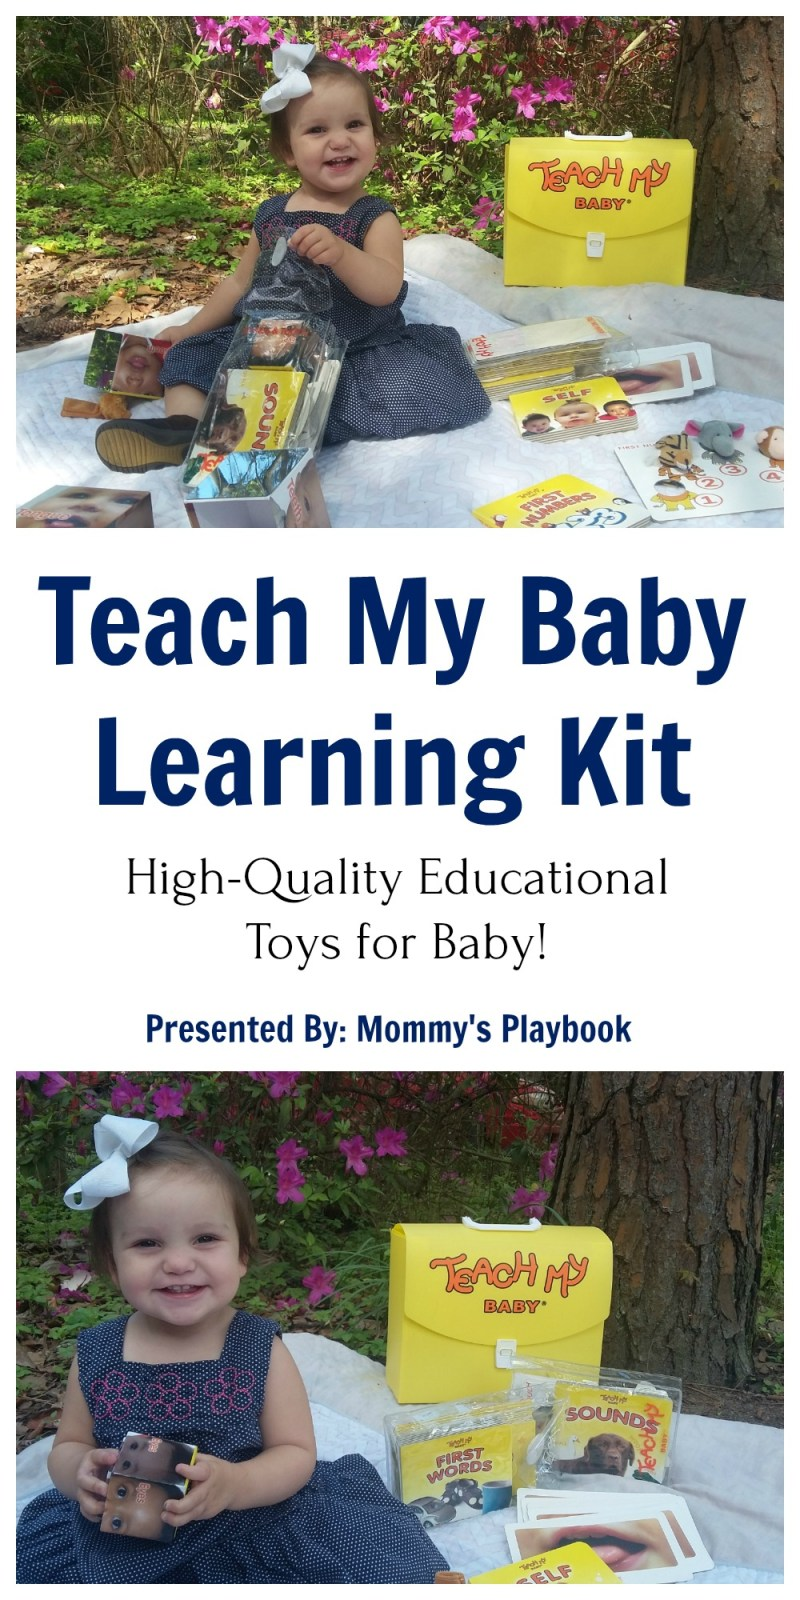 Teach My Baby Learning Kit #BabyGift #Baby #TeachMyBaby #Babyshower